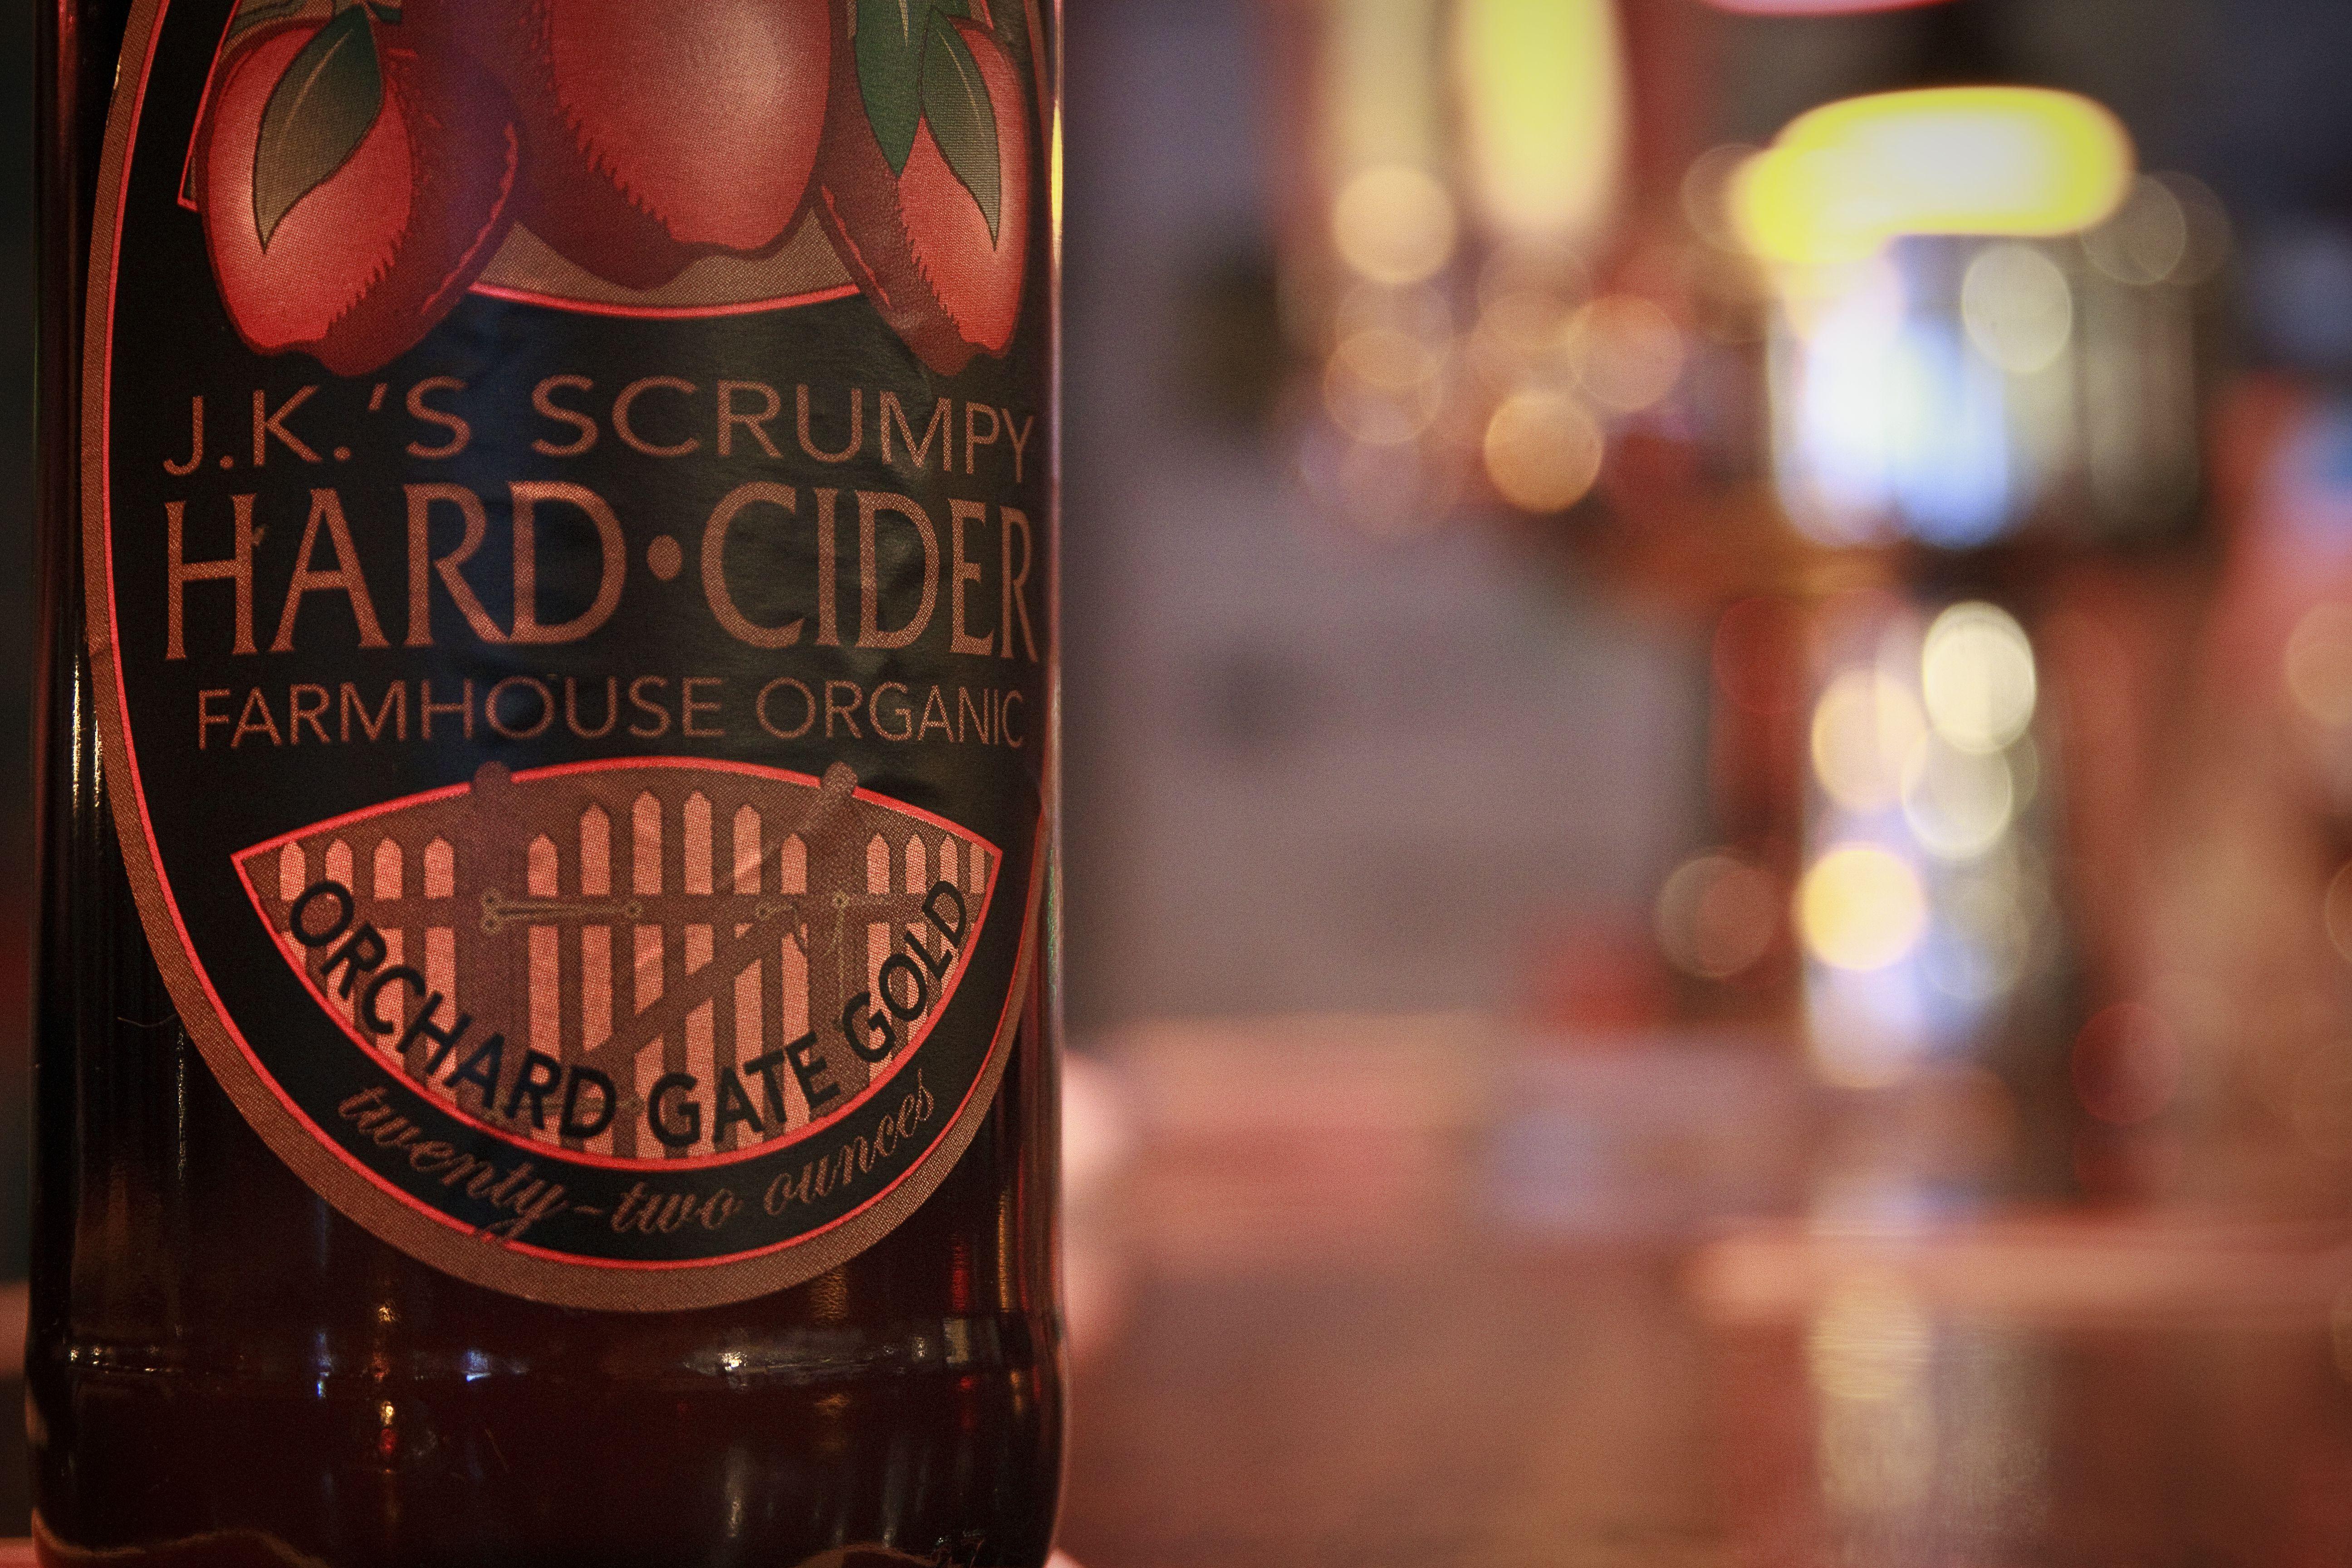 JK's Scrumpy Hard Cider